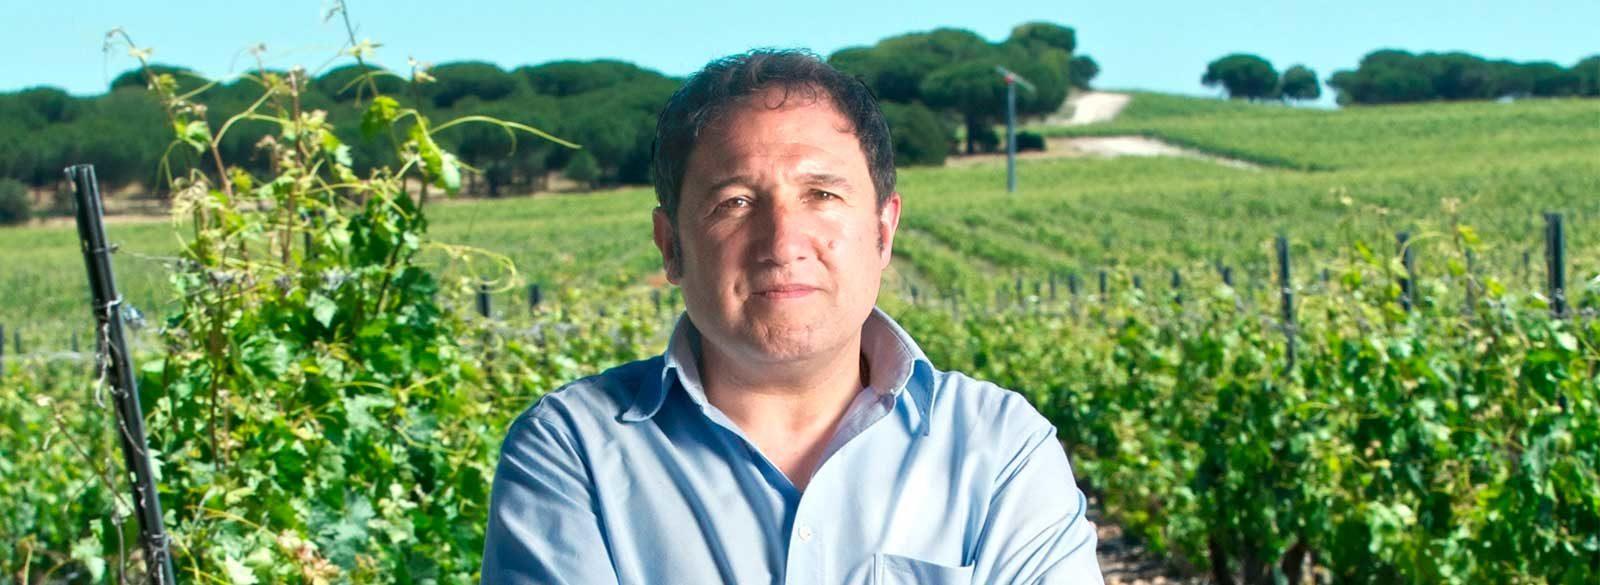 Entrevista a Ángel Anocibar, enólogo de Abadía Retuerta